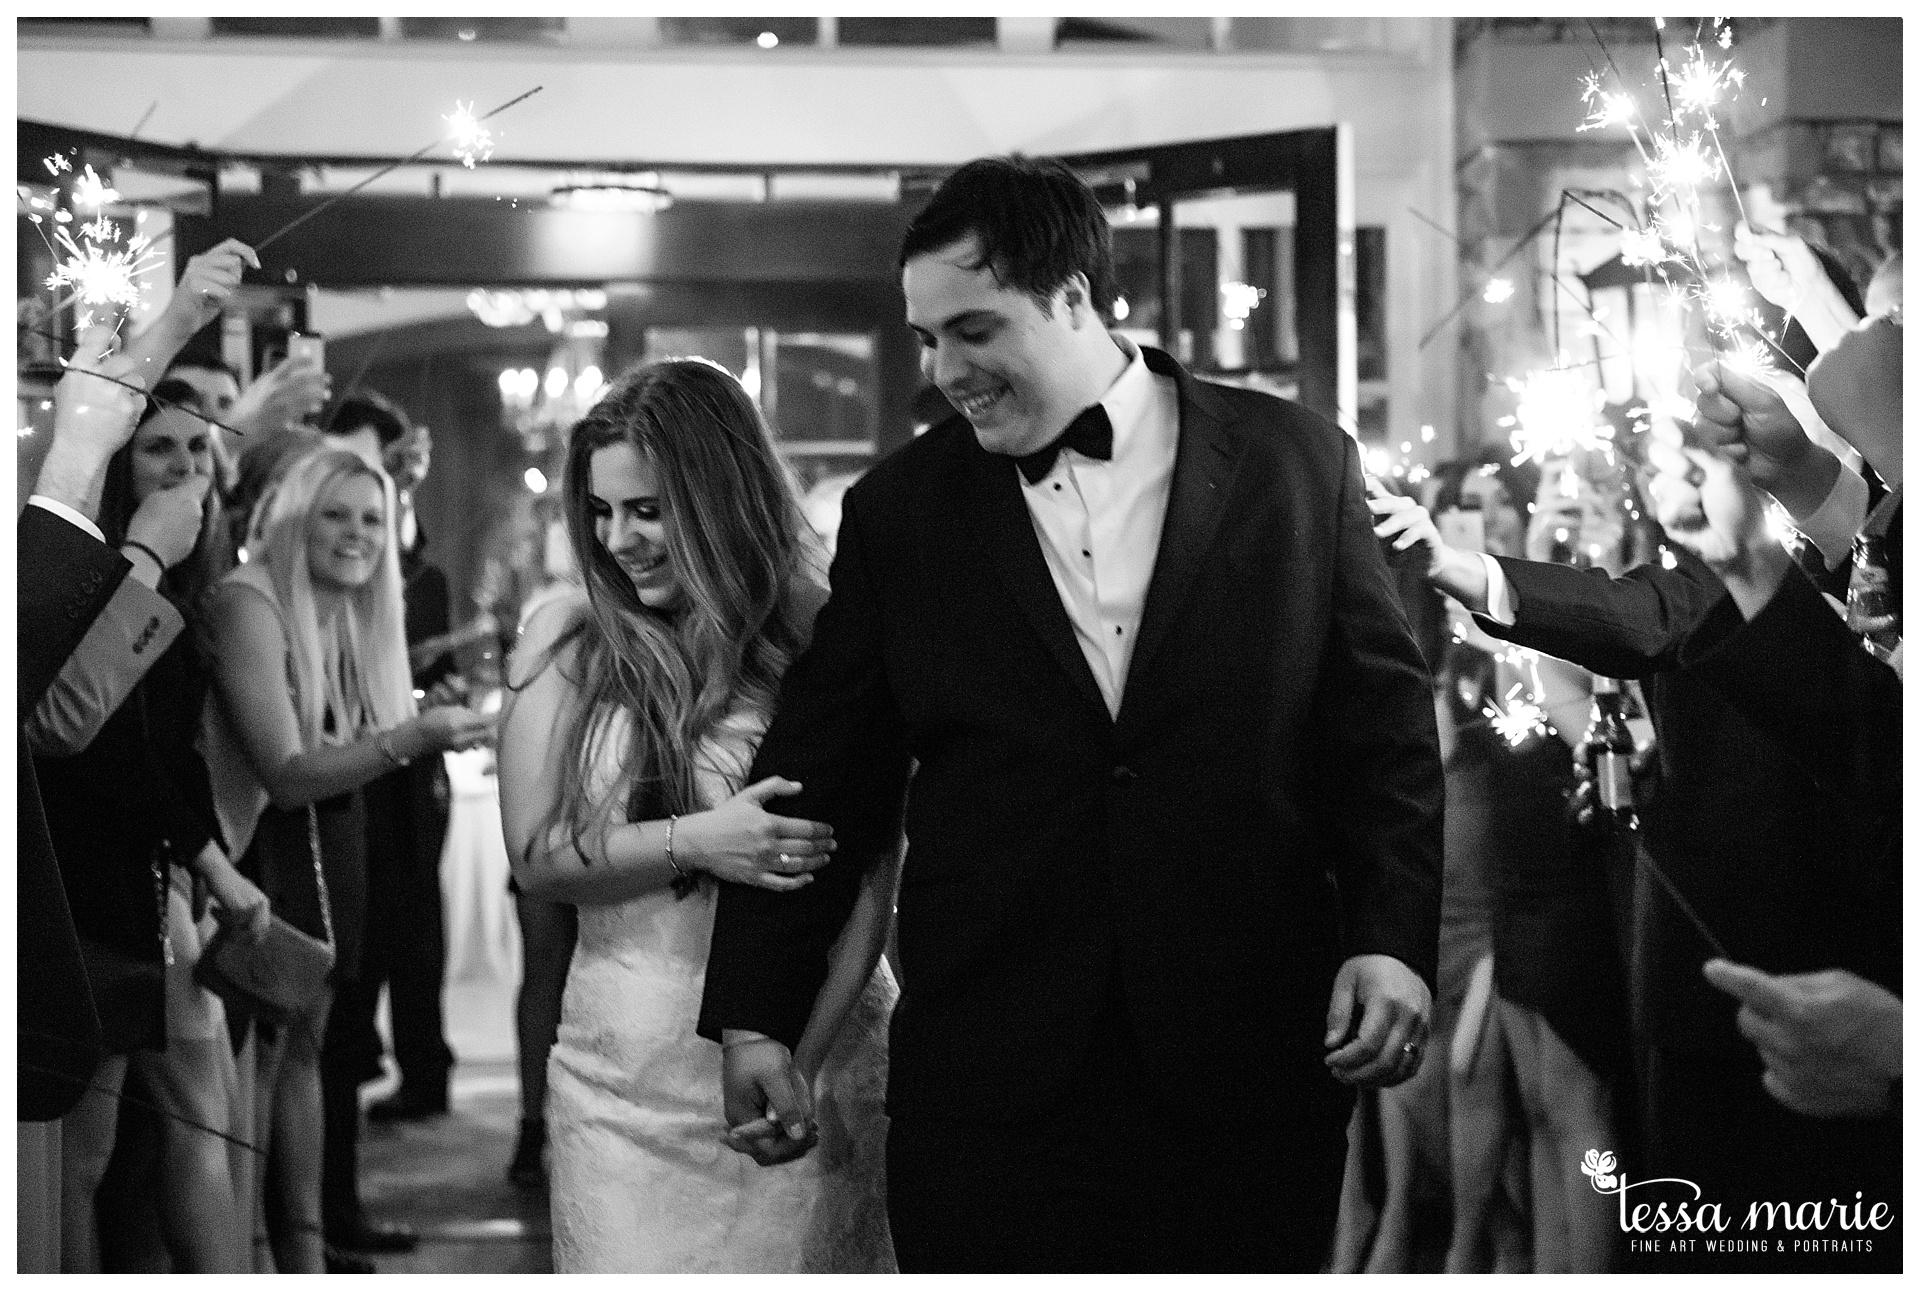 tessa_marie_weddings_legacy_story_focused_wedding_pictures_atlanta_wedding_photographer_0170